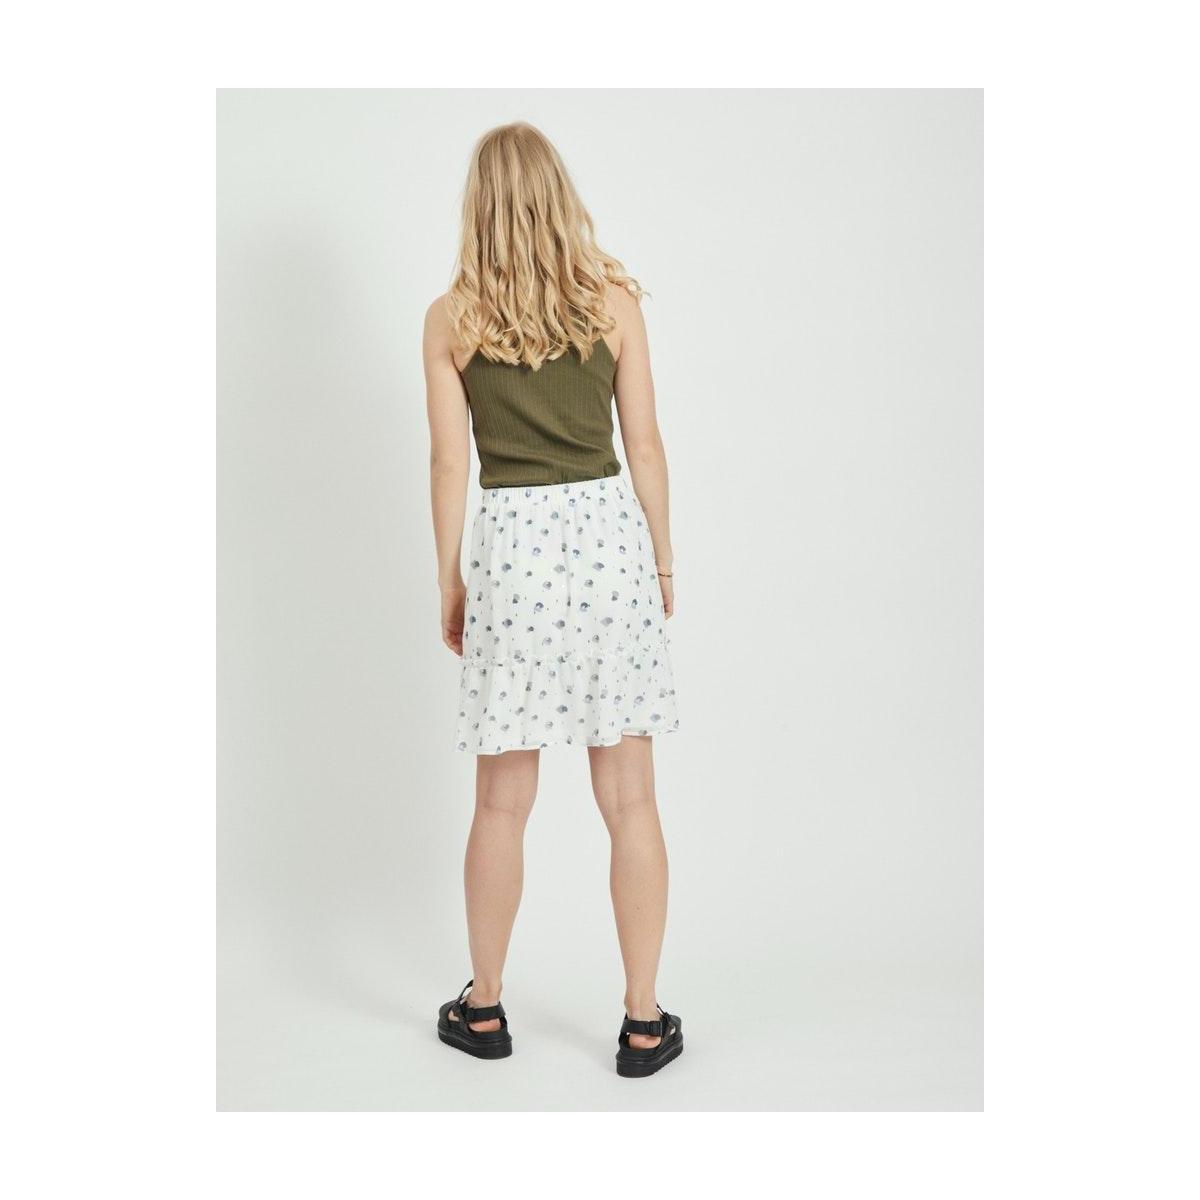 virillablunie hw skirt/l/su 14059057 vila rok cloud dancer